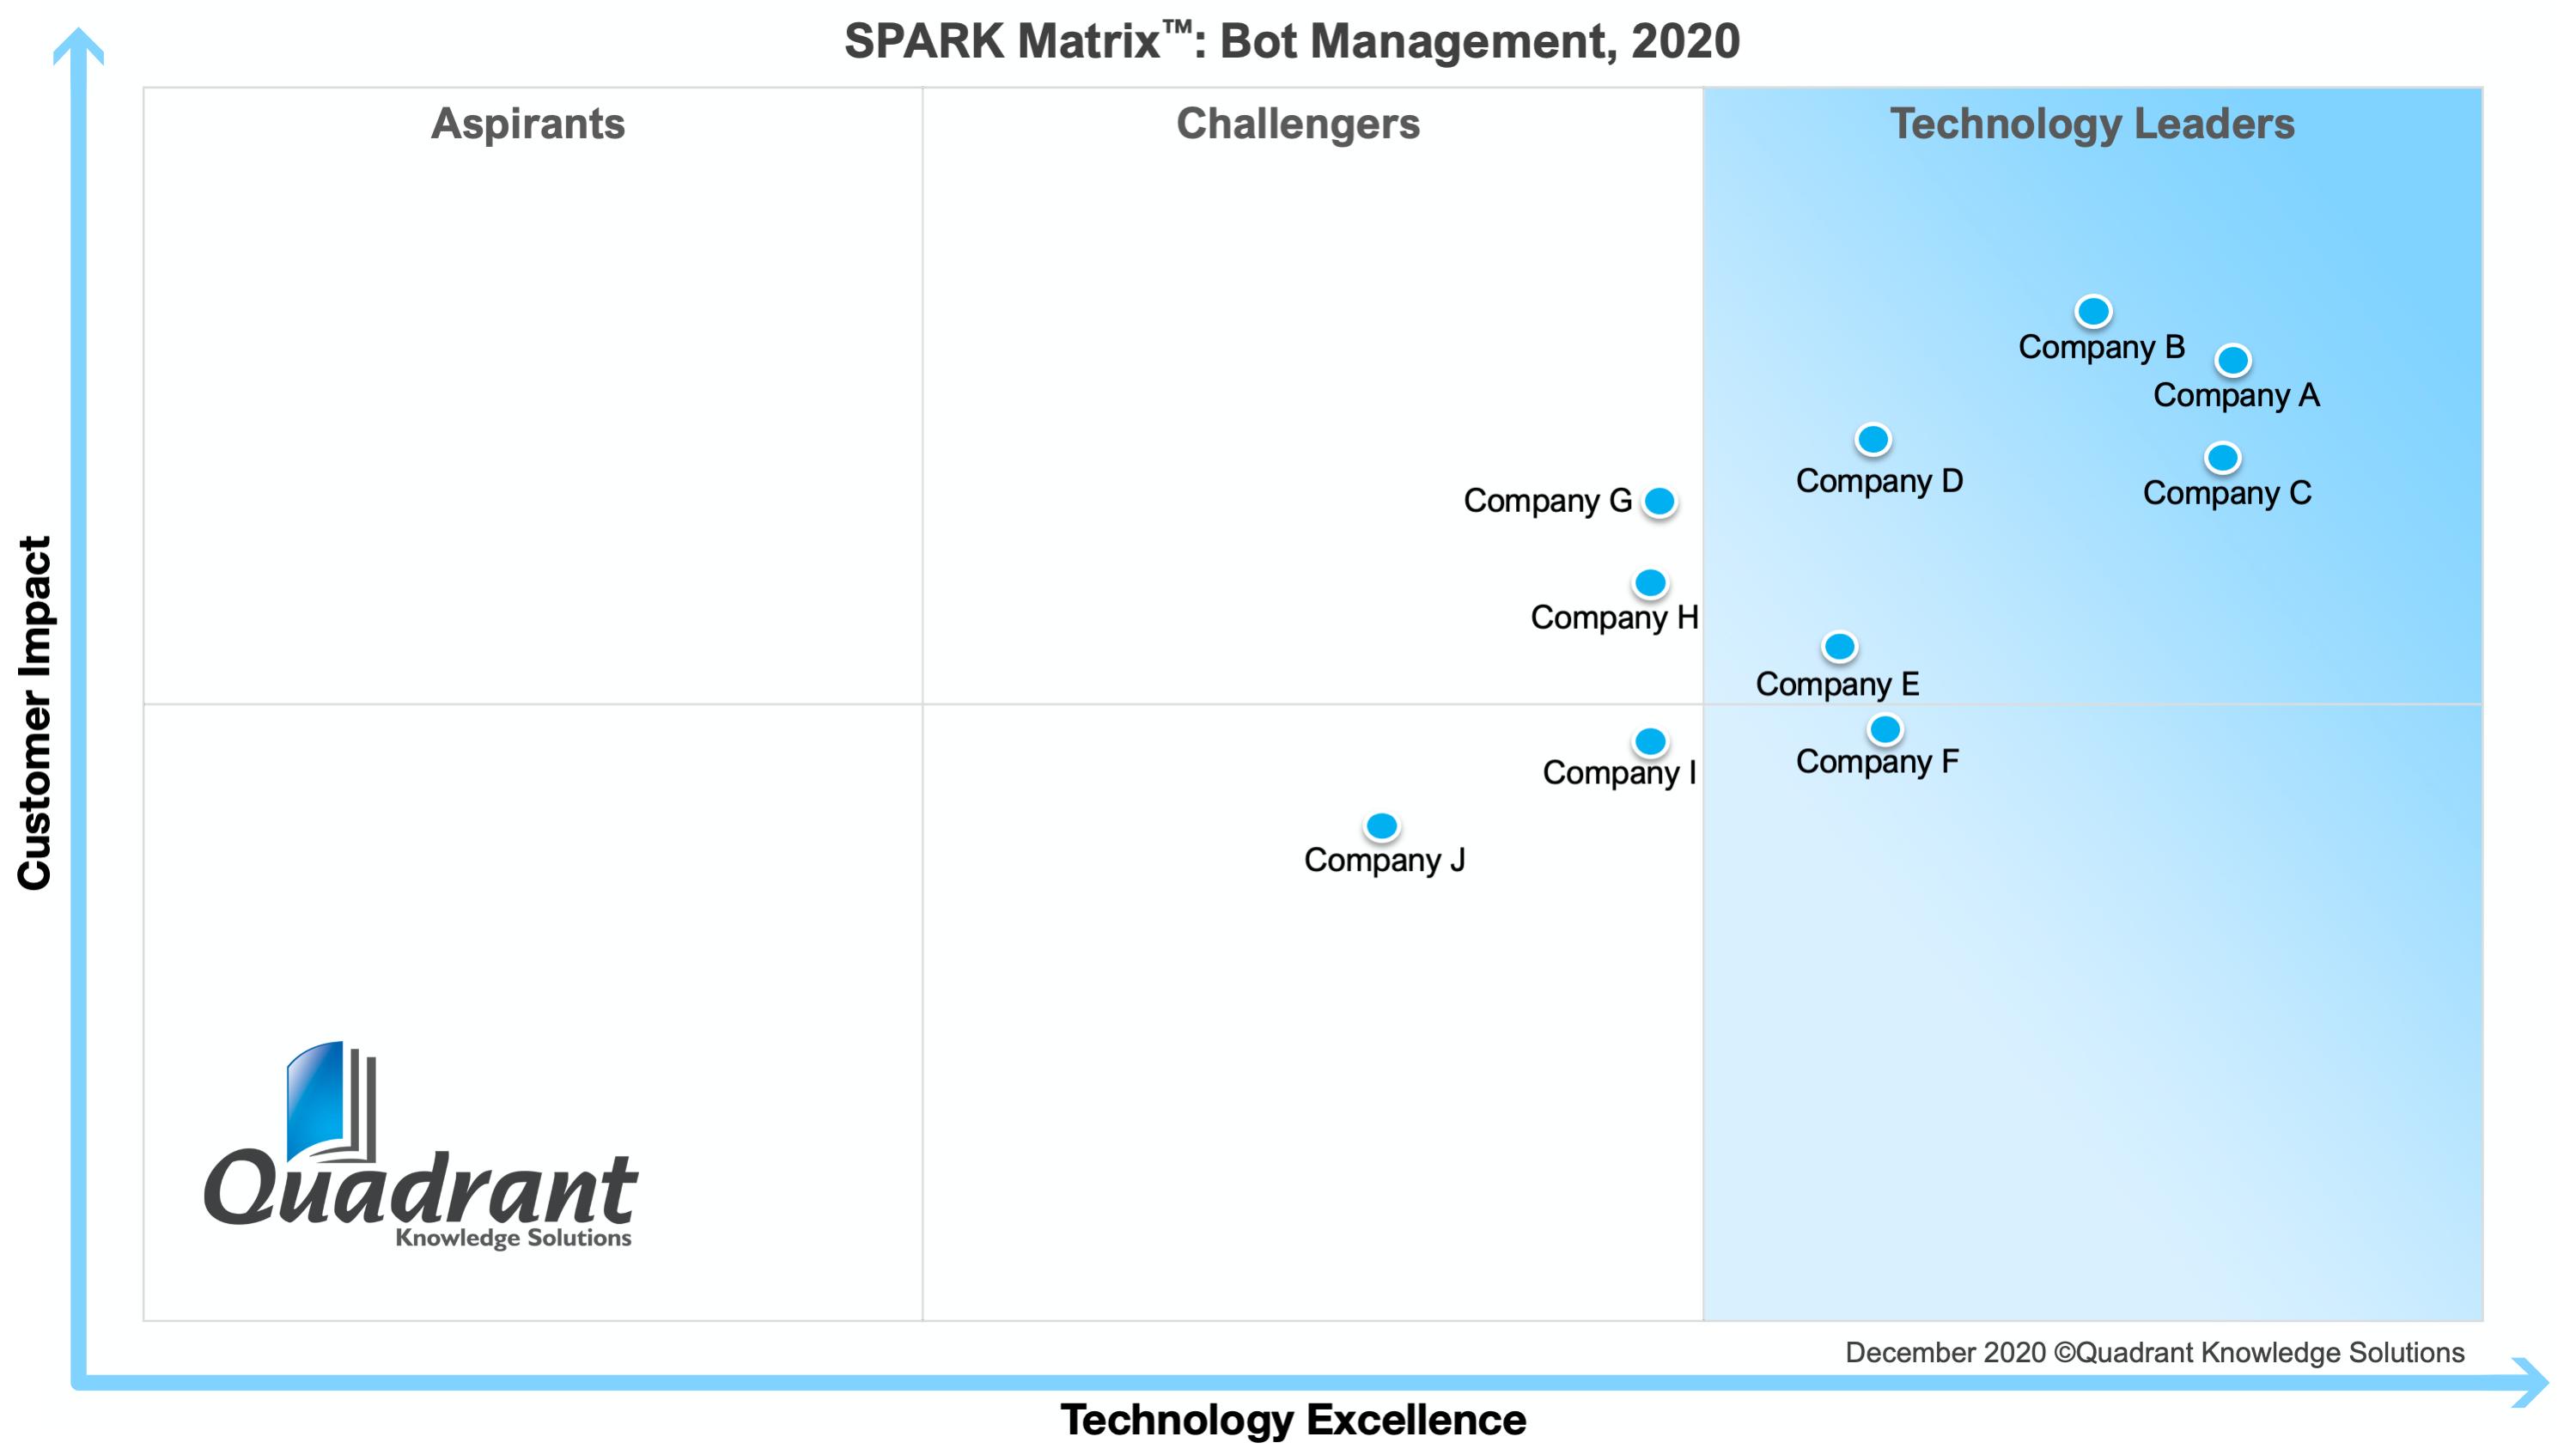 2020 SPARK Matrix Bot Management Quadrant Knowledge Solutions